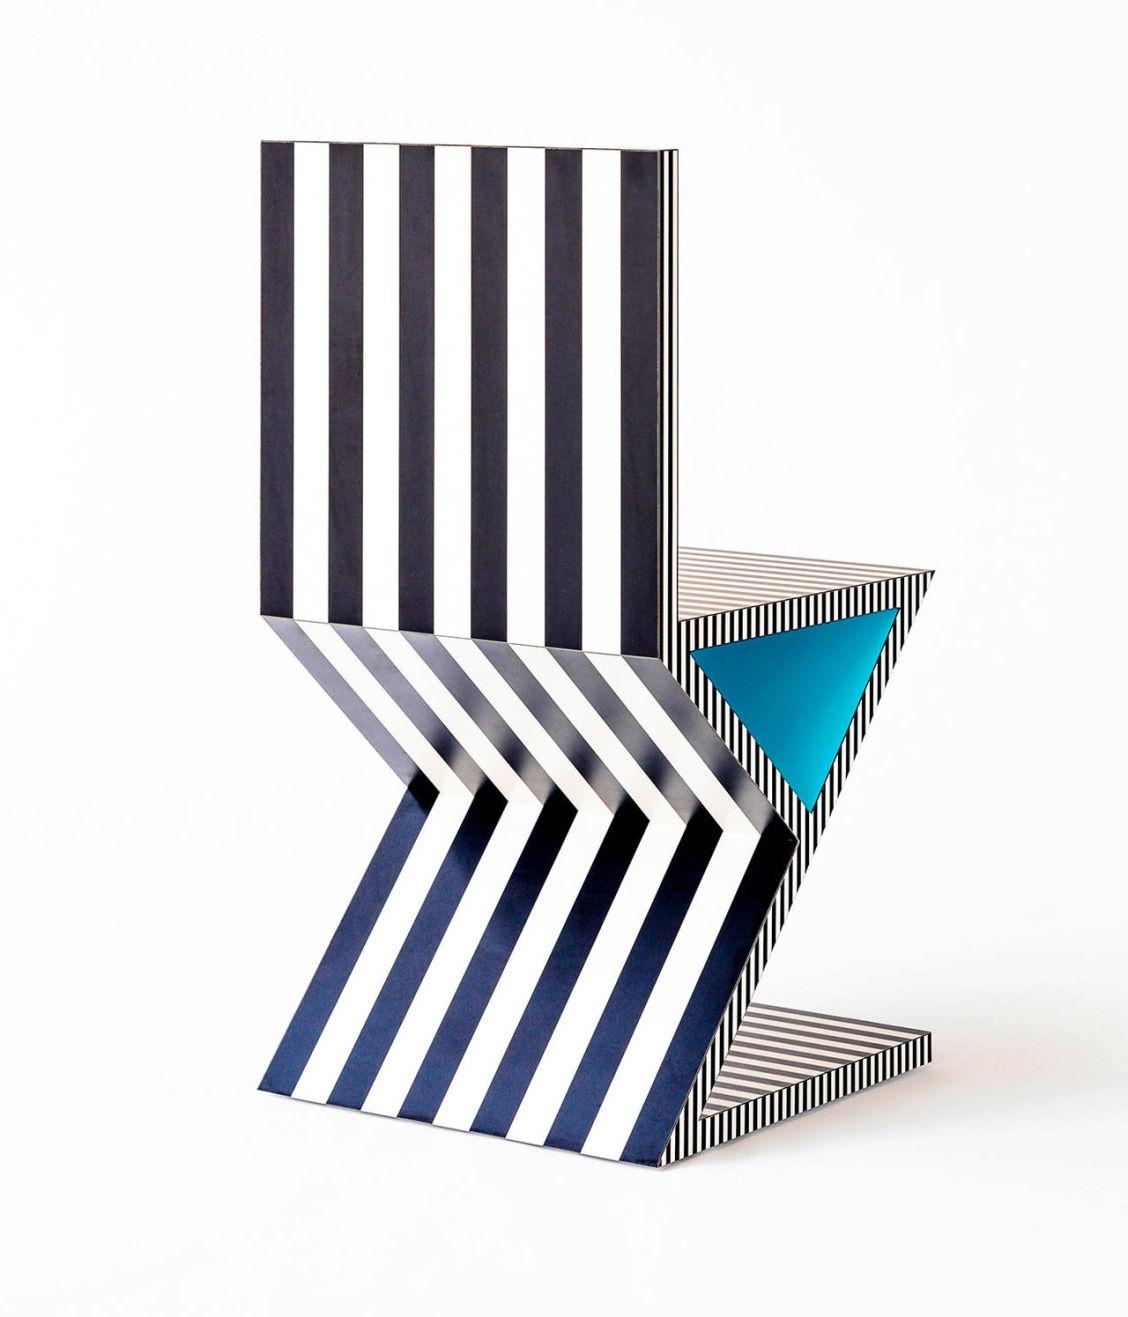 Contemporary Furniture Memphis: Memphis Inspired Chair, Neo Laminati Collection